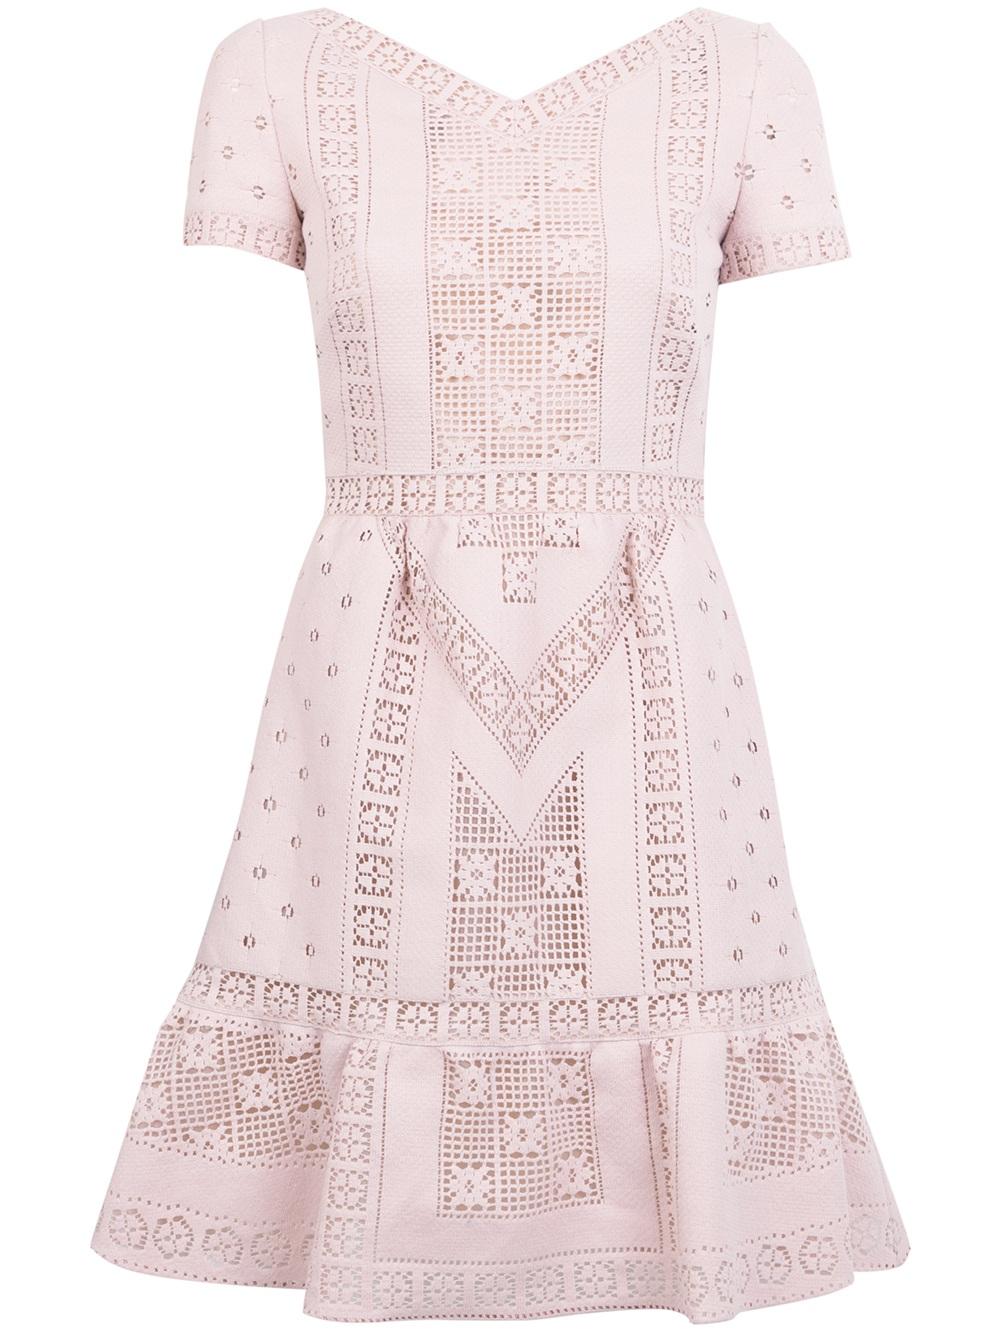 fc0fd851cdd8 Valentino Crochet Knit Dress in Pink - Lyst